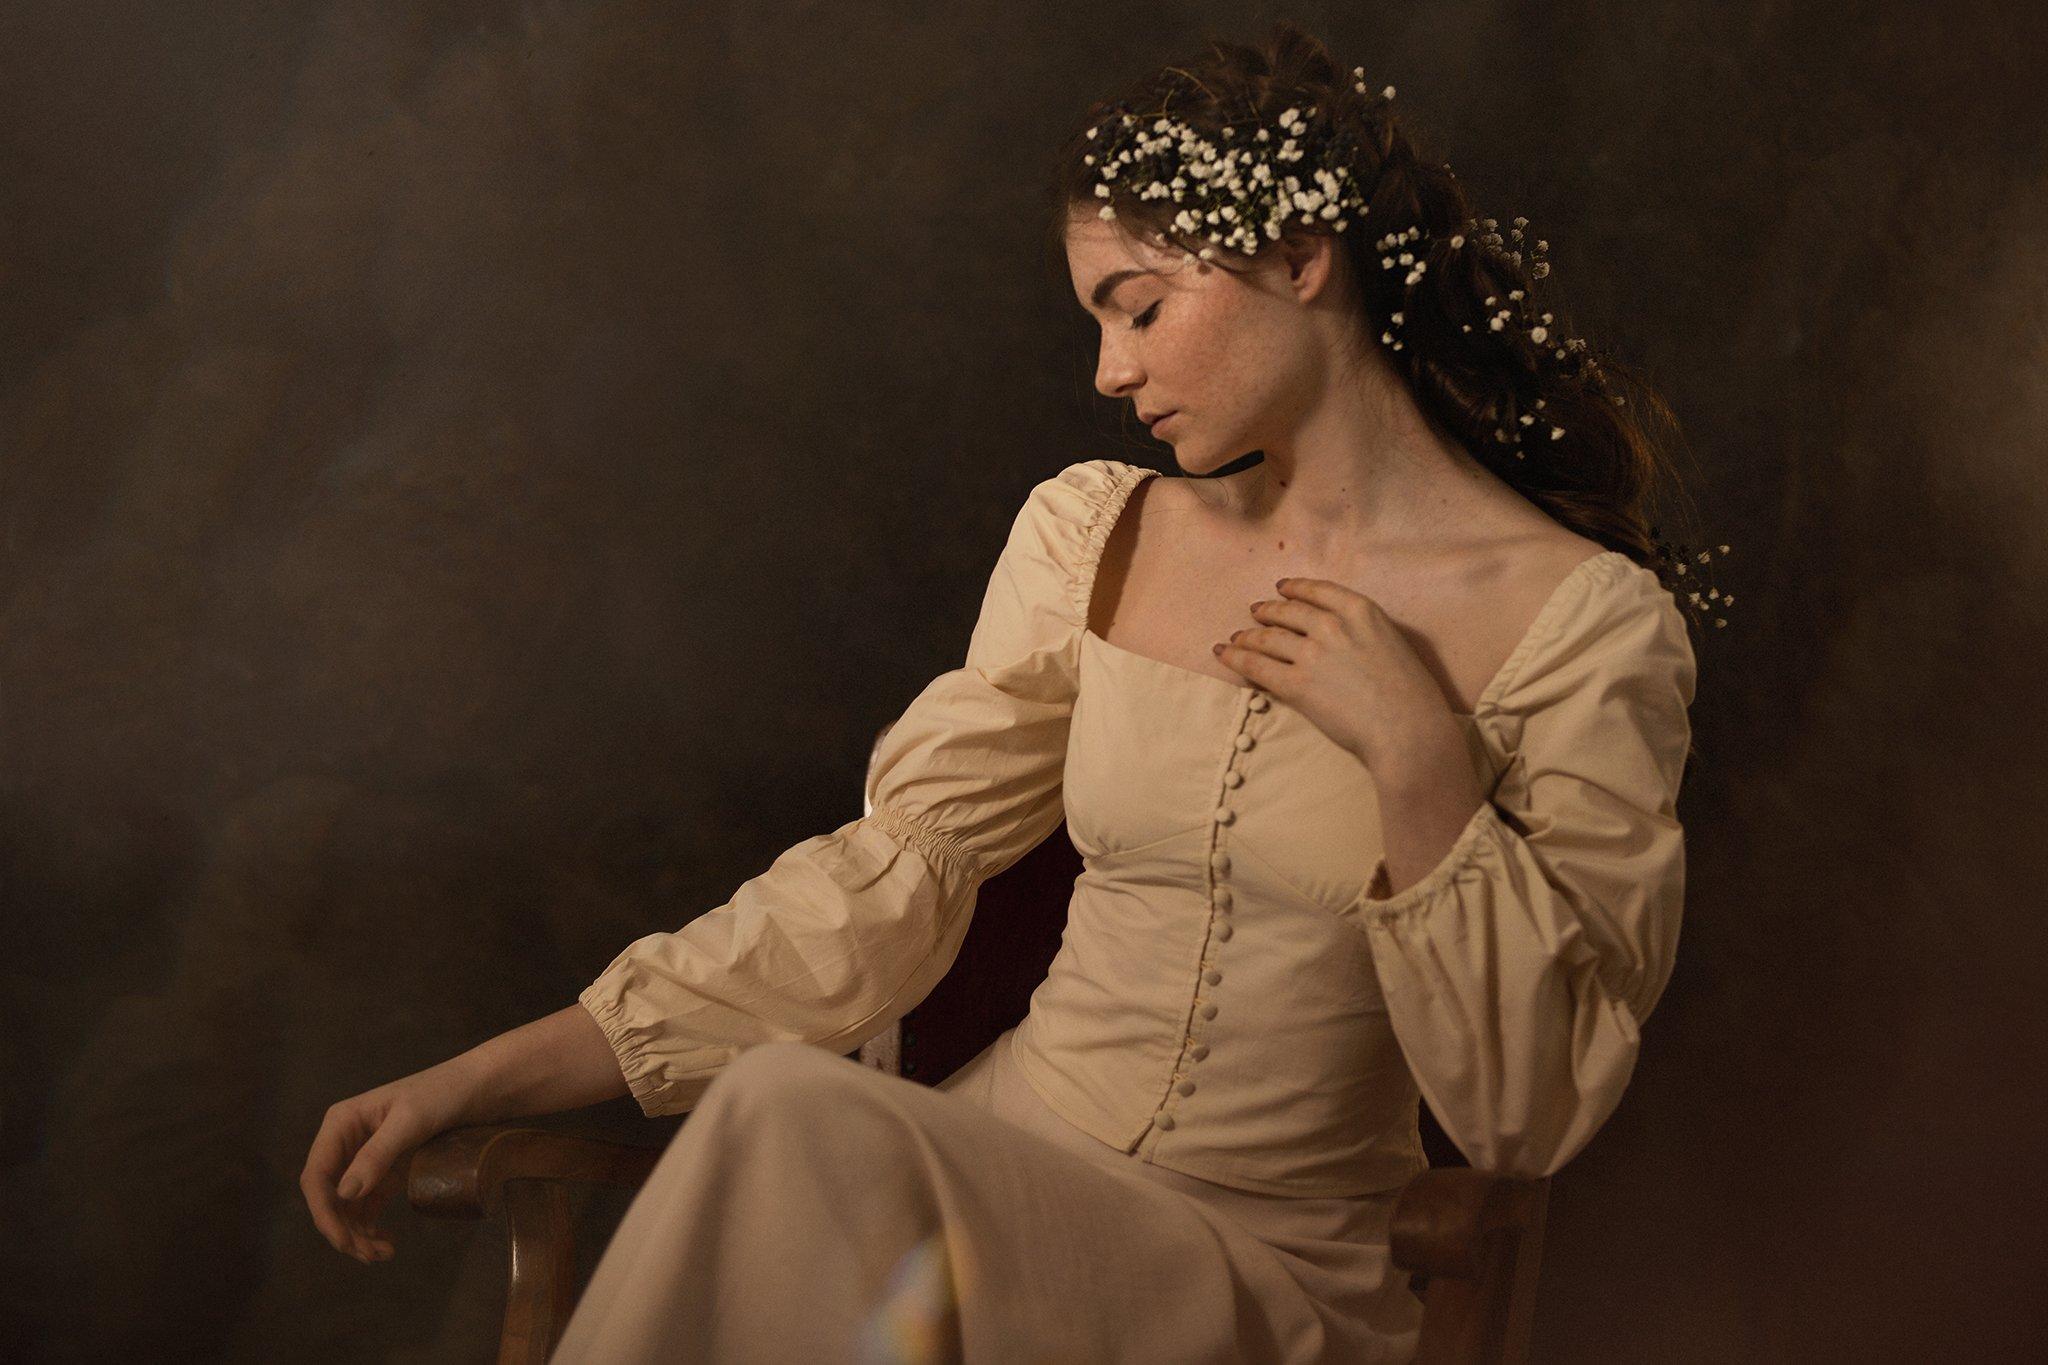 фото, девушка, портрет, photo, portrait, canon, Елена Daedra Алферова